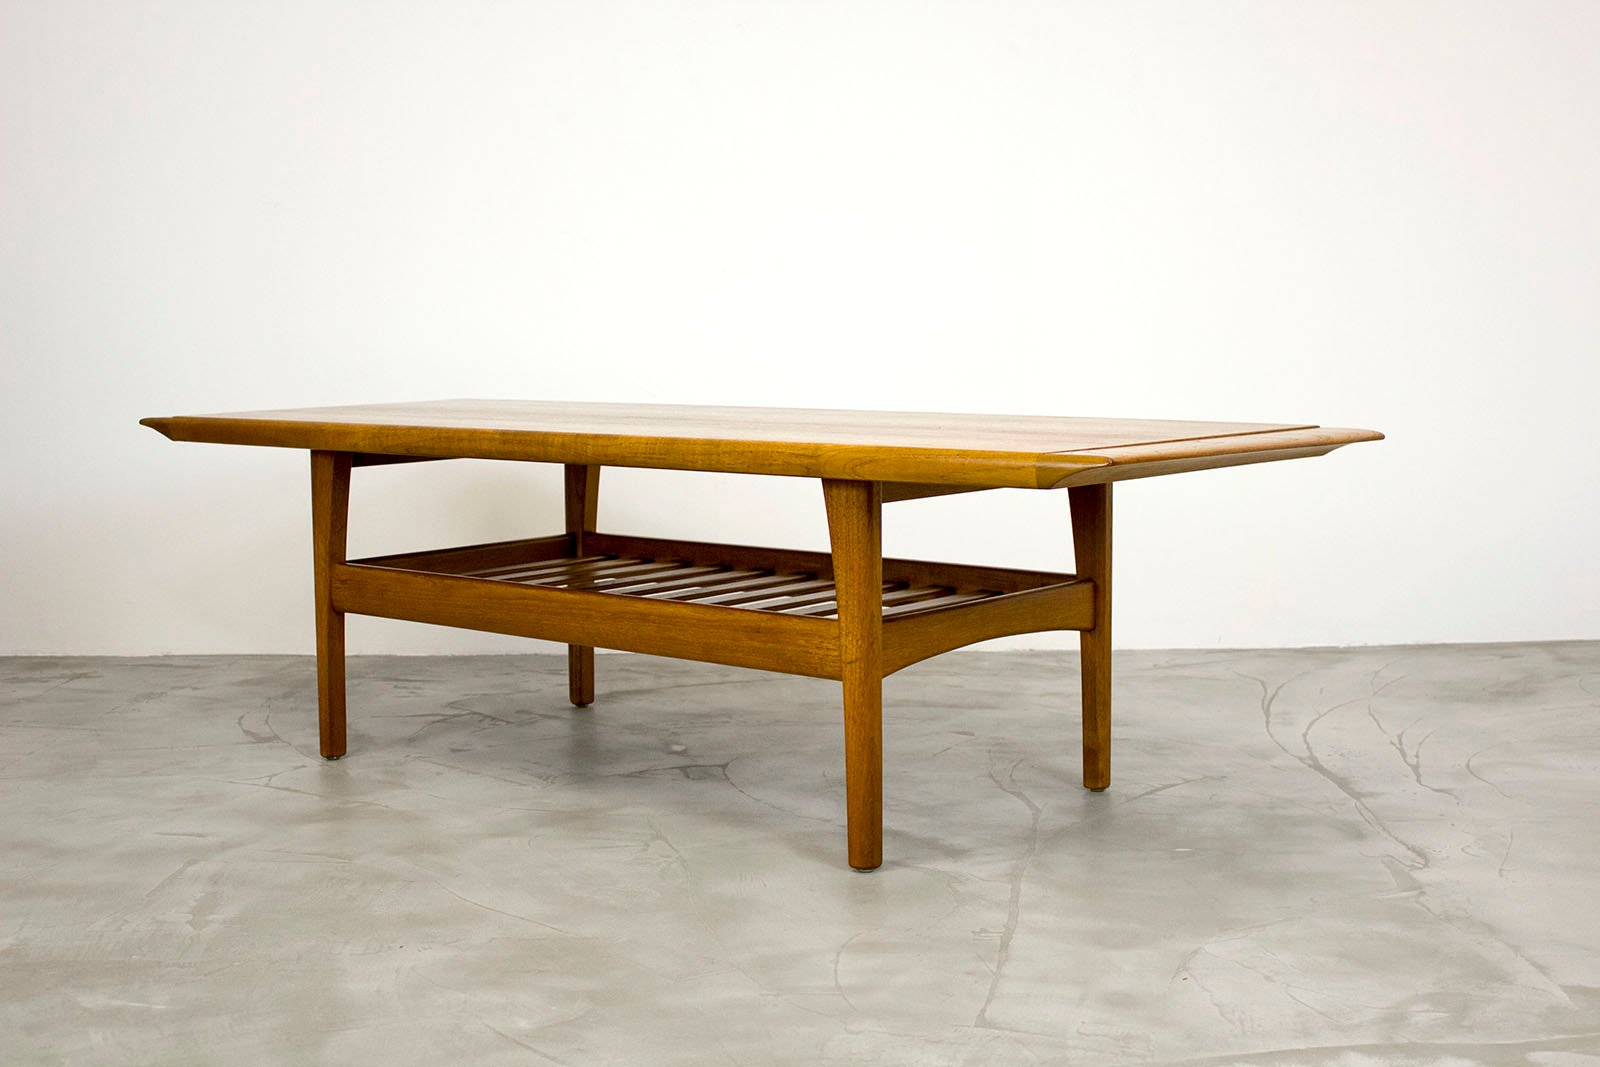 Danish Teak Coffee Table With Magazine Shelf 1960s For Sale At Pamono